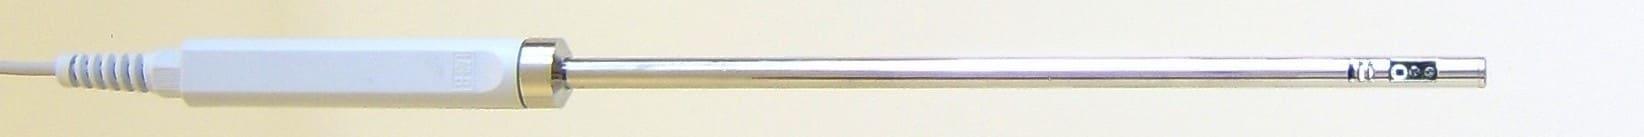 LB-583 thermo-hygrometer